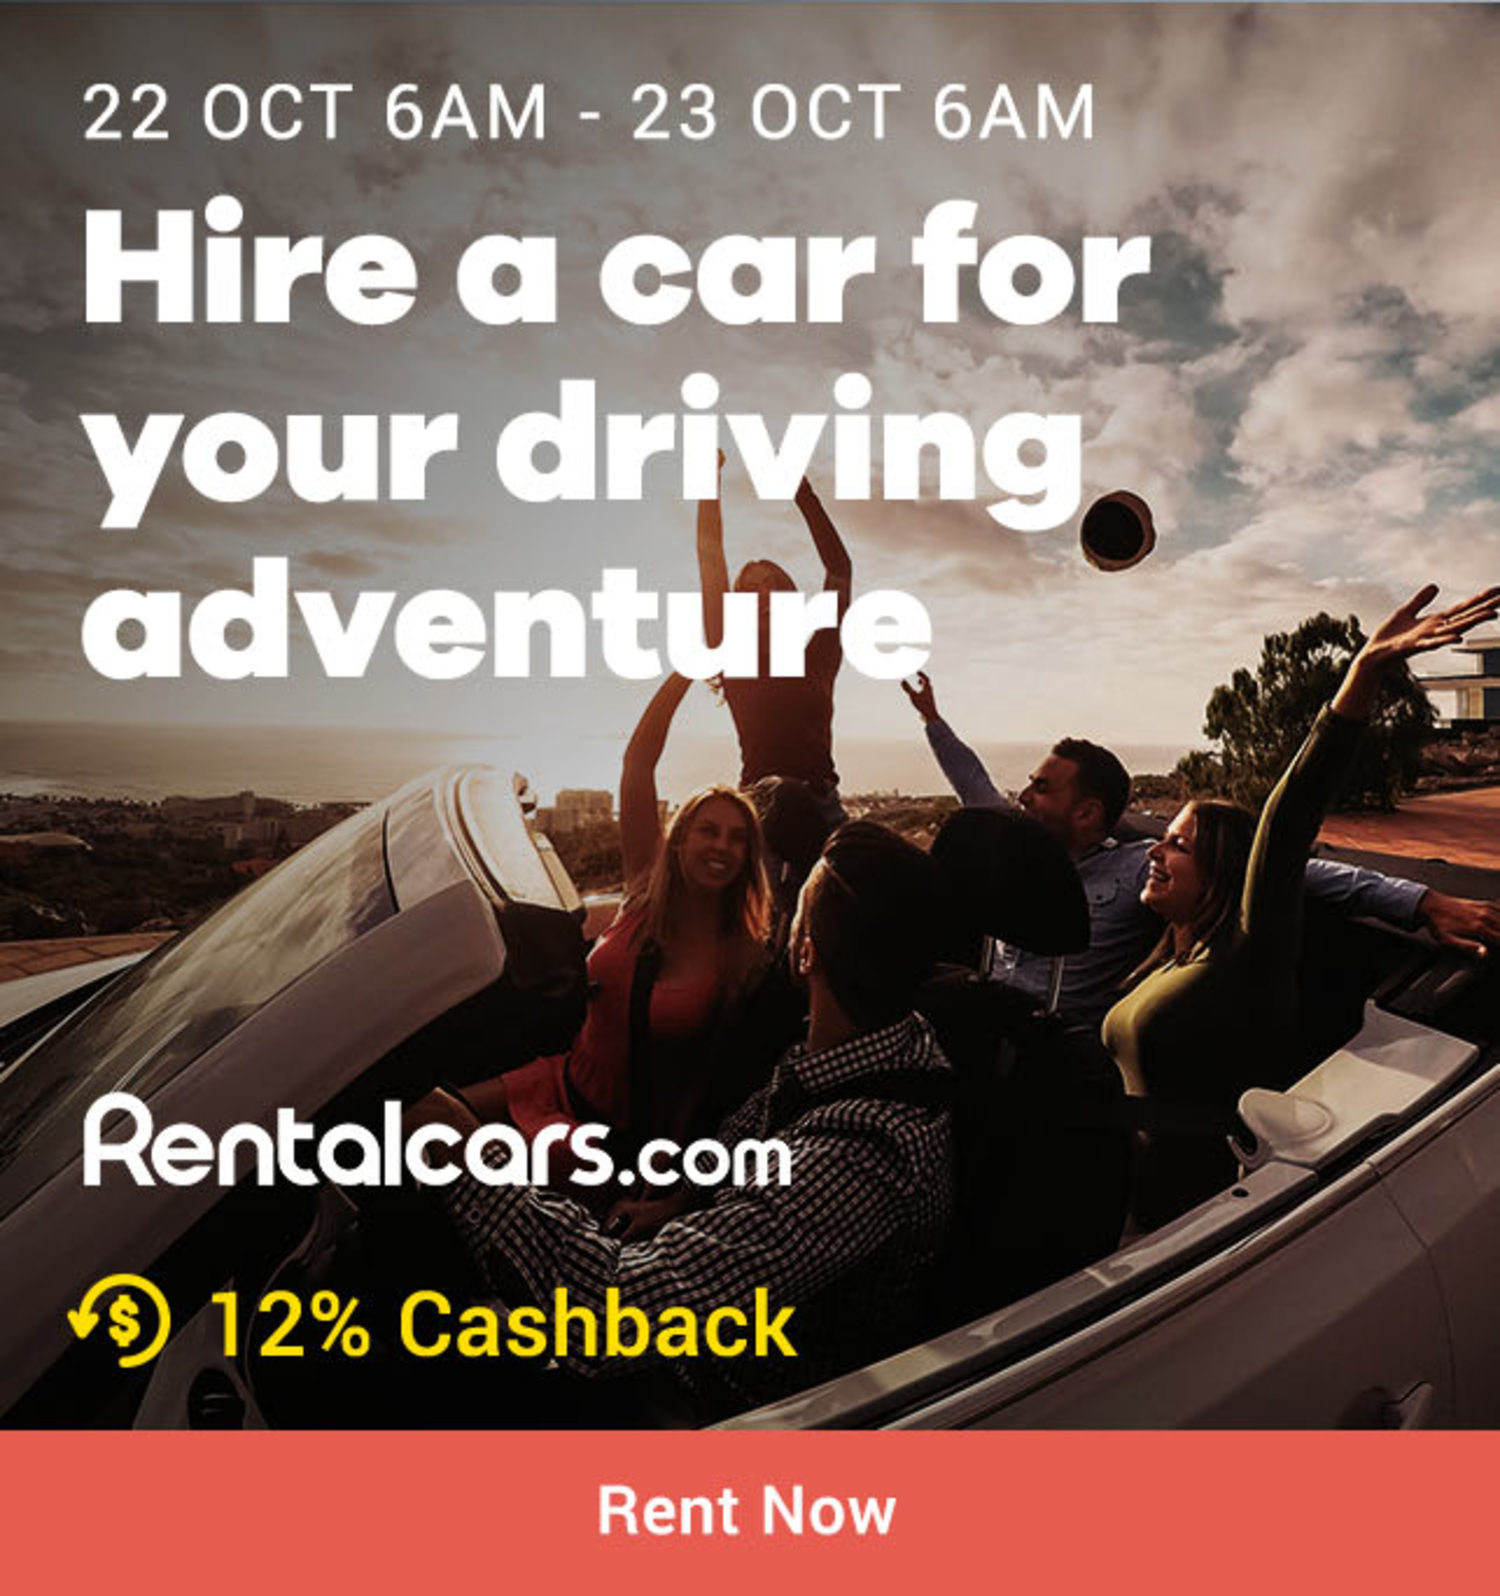 Rentalcars.com: Hire a car for your driving destination